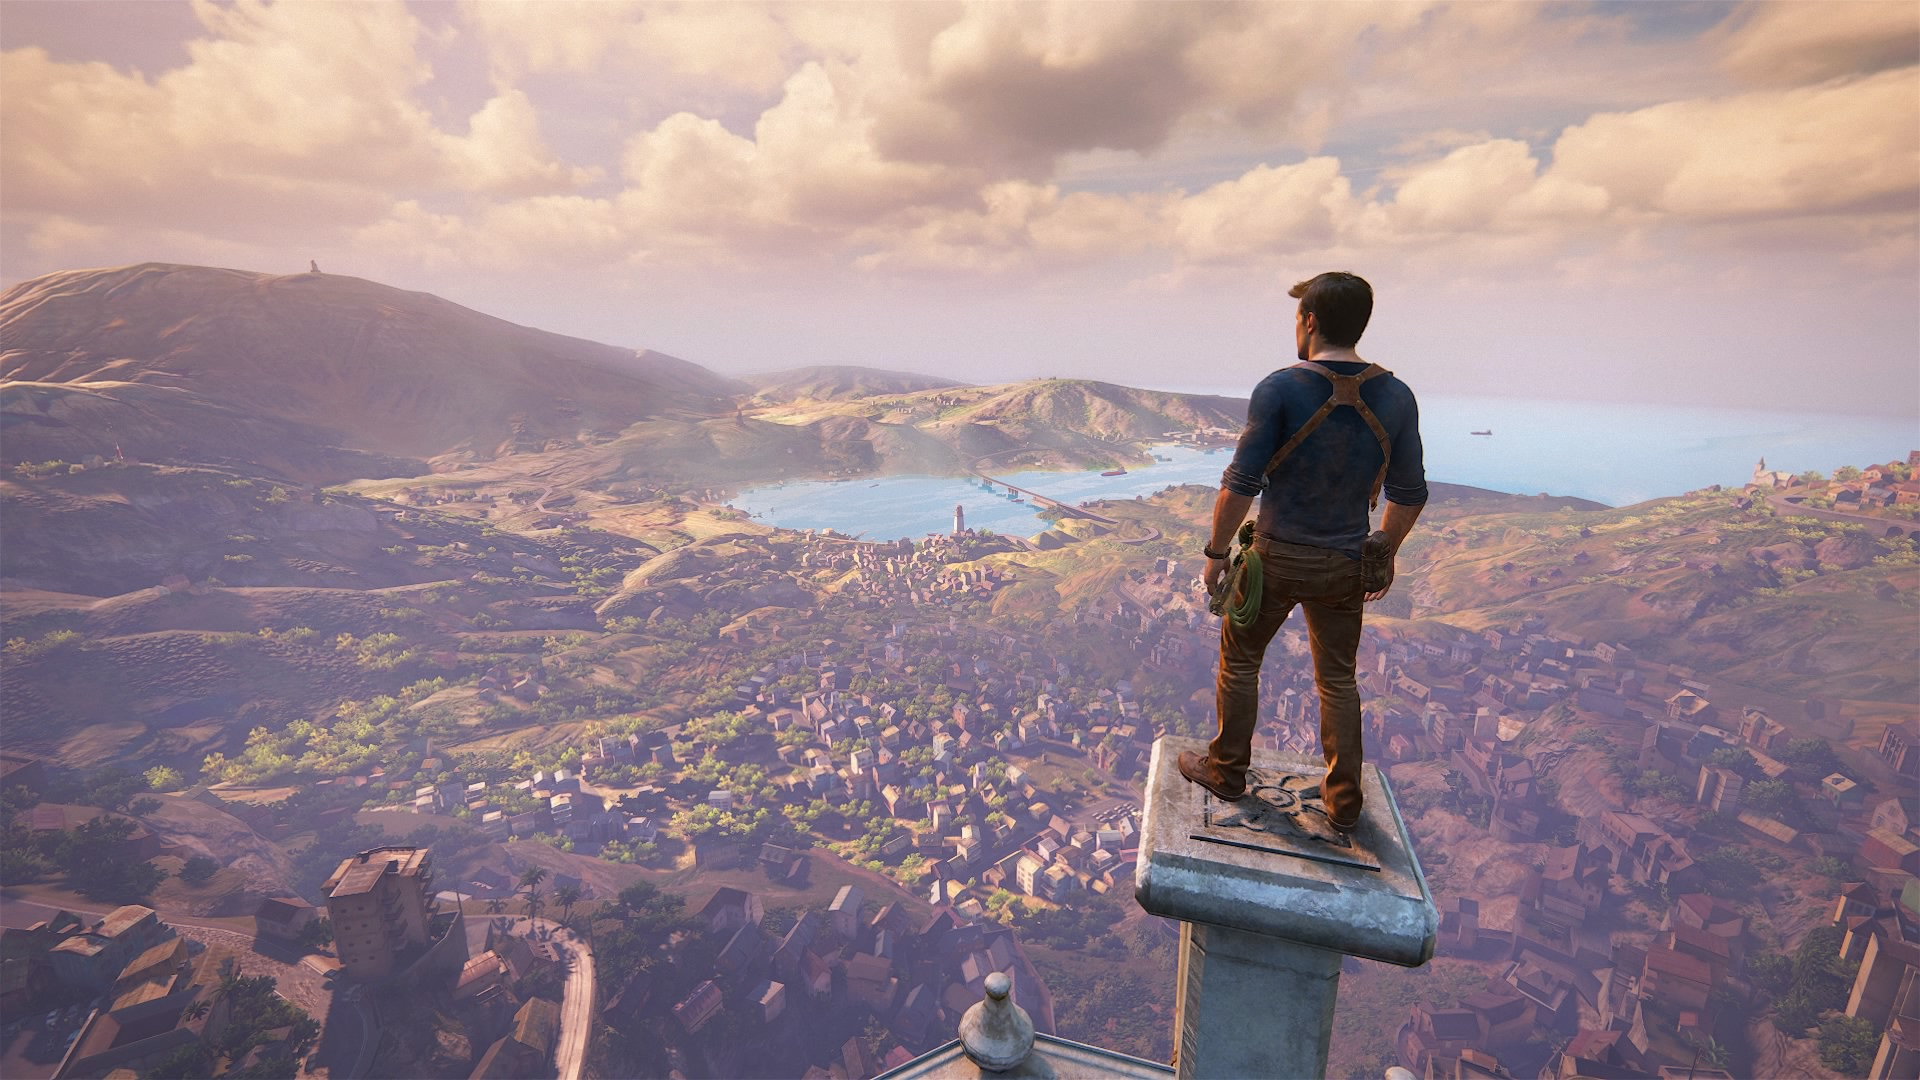 Le tournage du film Uncharted va bientôt commencer